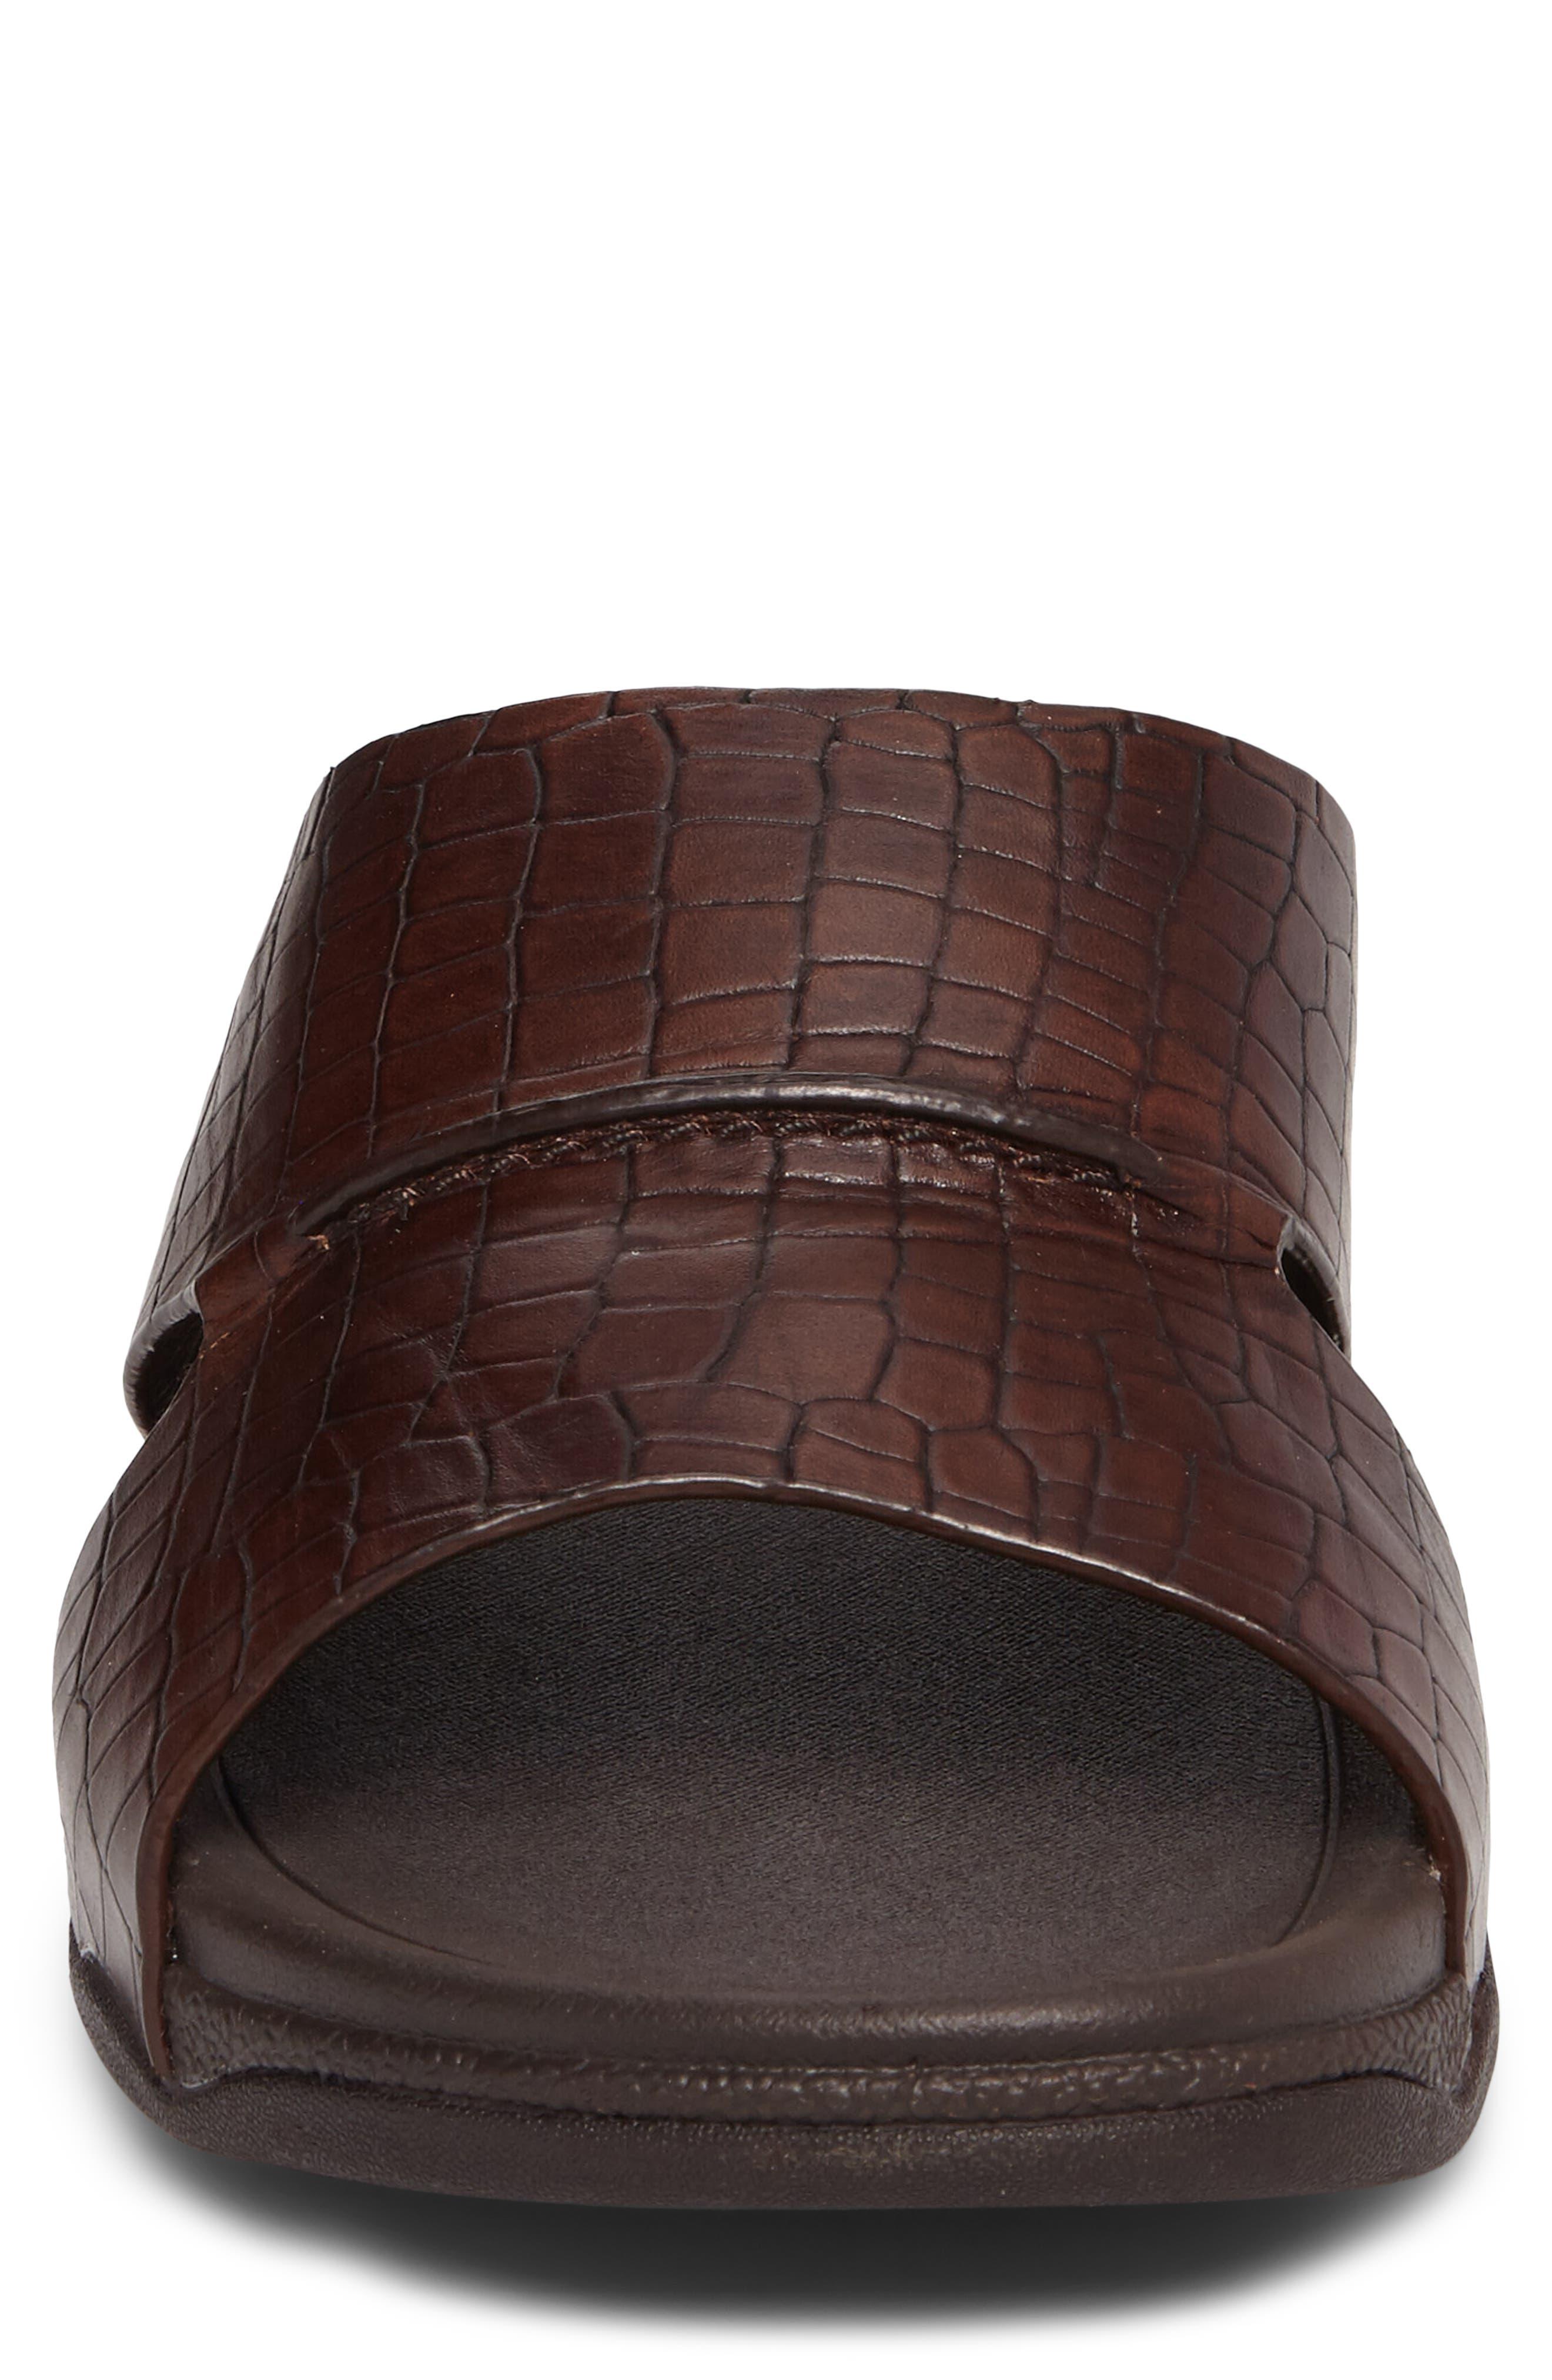 Bando Slide Sandal,                             Alternate thumbnail 4, color,                             CHOCOLATE LEATHER